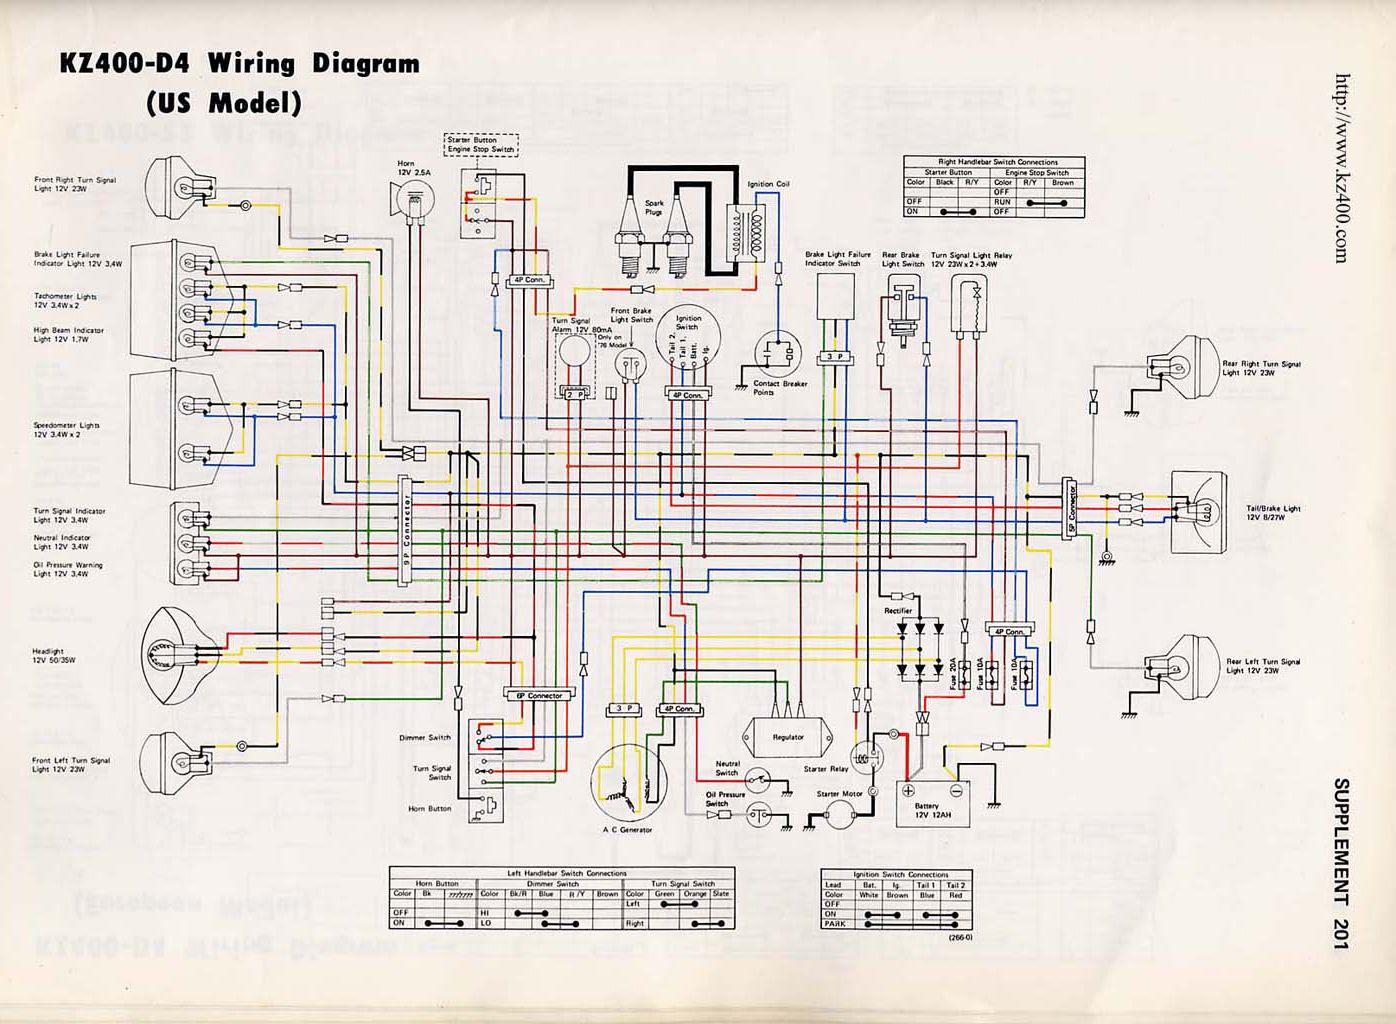 1976 kz400 wiring diagram wiring diagram site Vulcan 750 Wiring Diagram